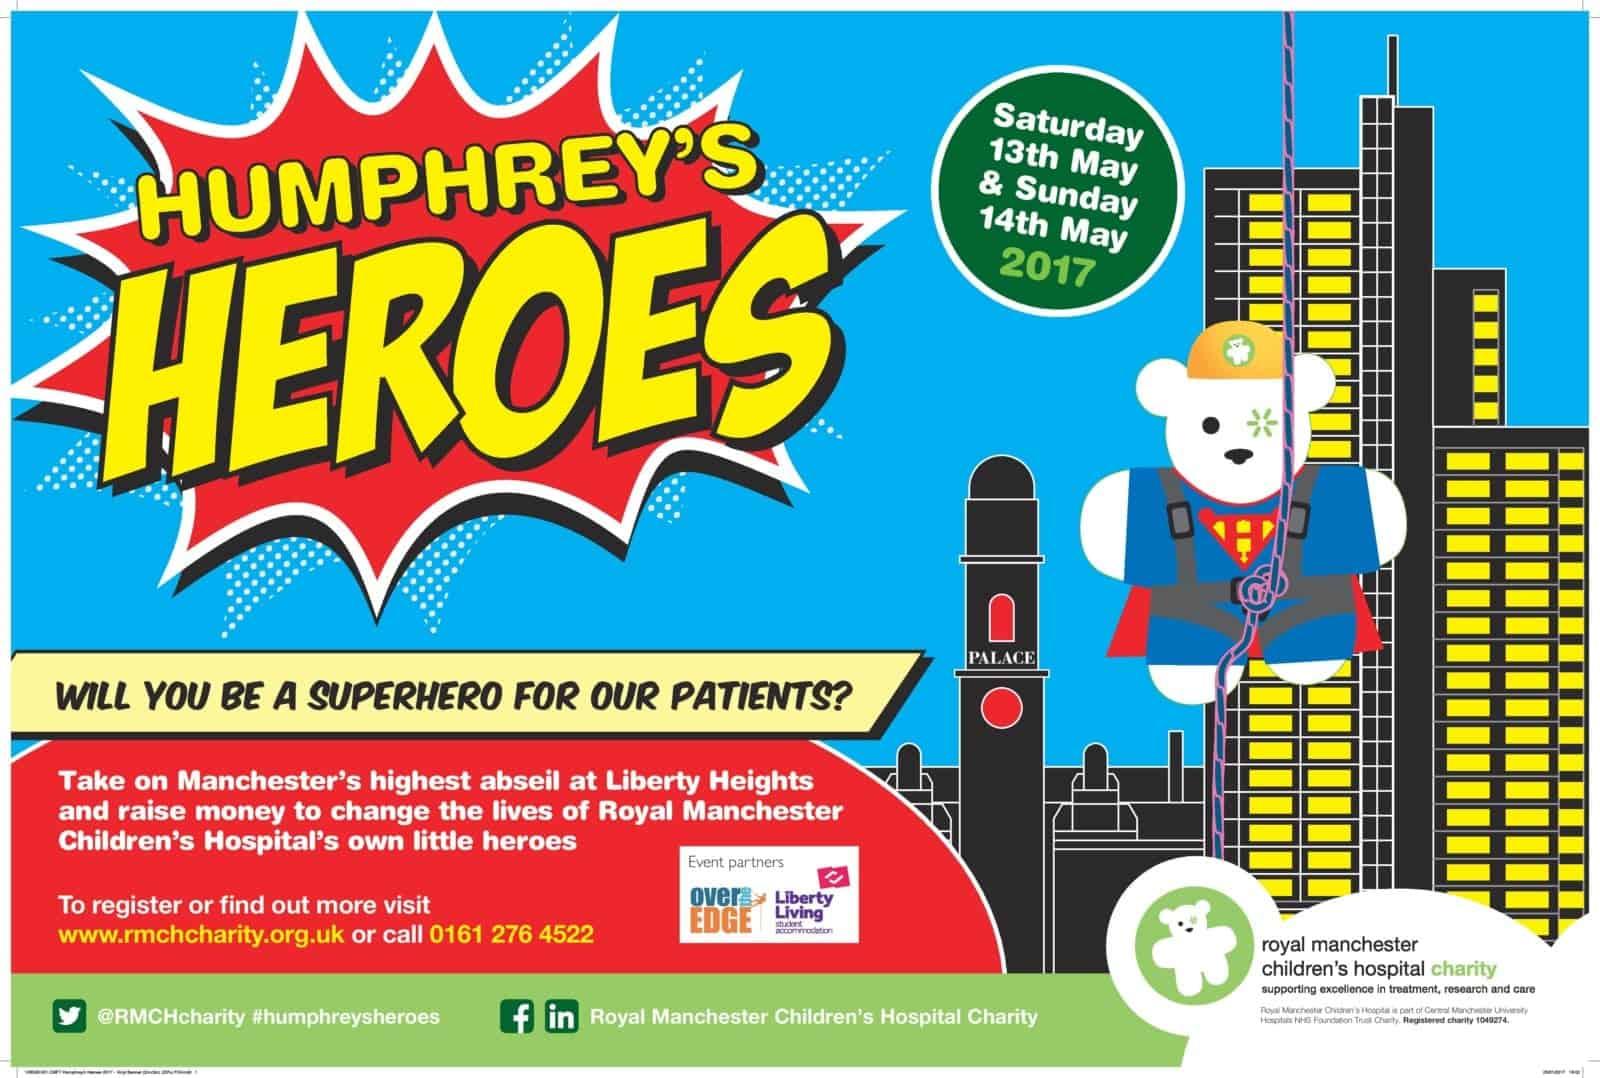 Humphrey's Heroes charity banner